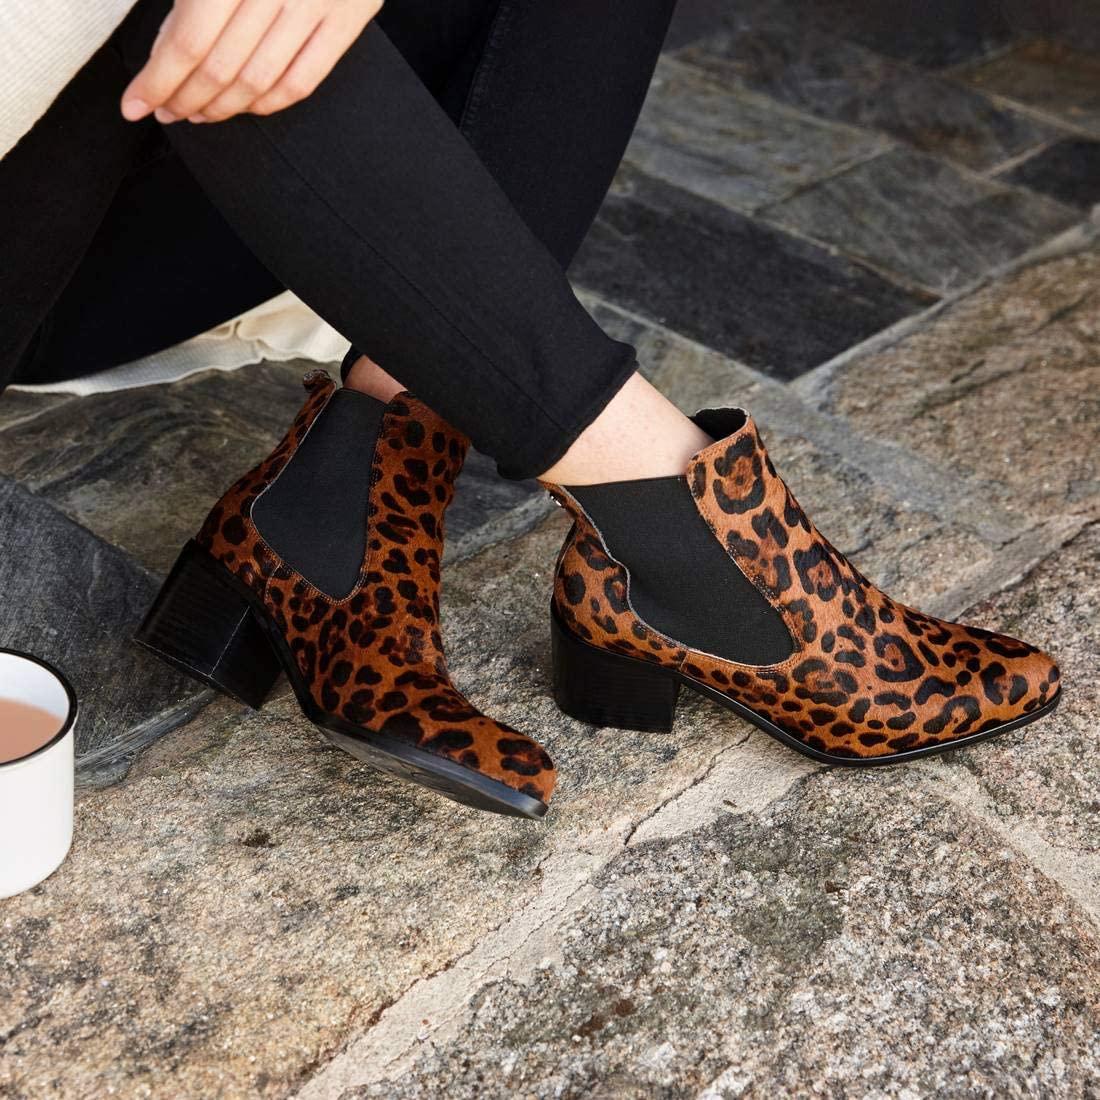 Carmela - 67382 - Leopard Print Leather Ankle Boots